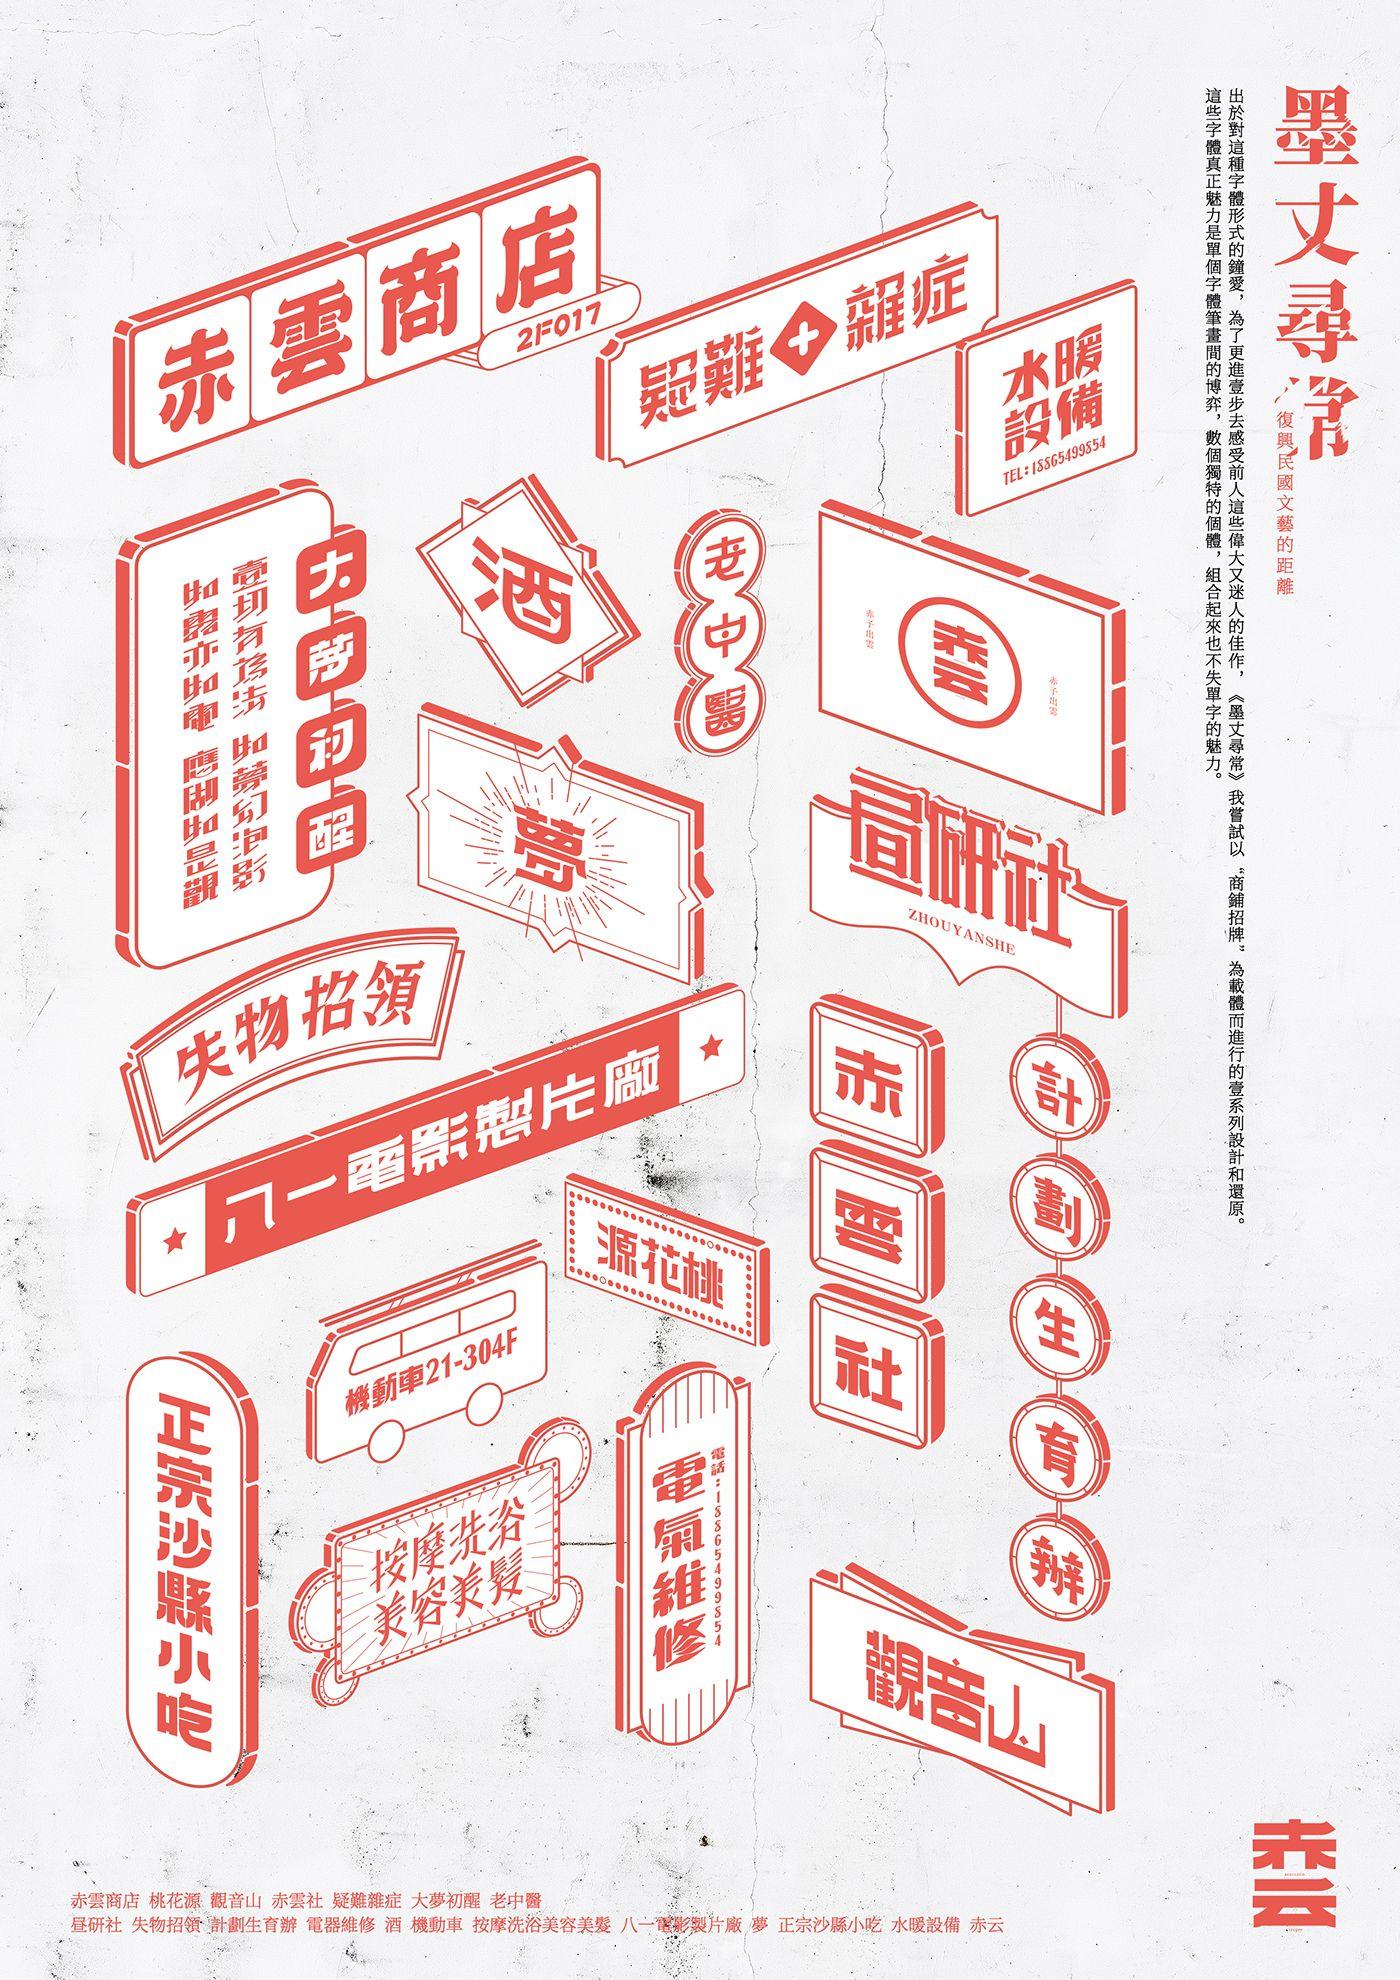 美术字系列 墨丈寻常 平面 字体 字形 行行珂 原创作品 站酷 Zcool Chinese Typography Design Graphic Design Posters Chinese Fonts Design